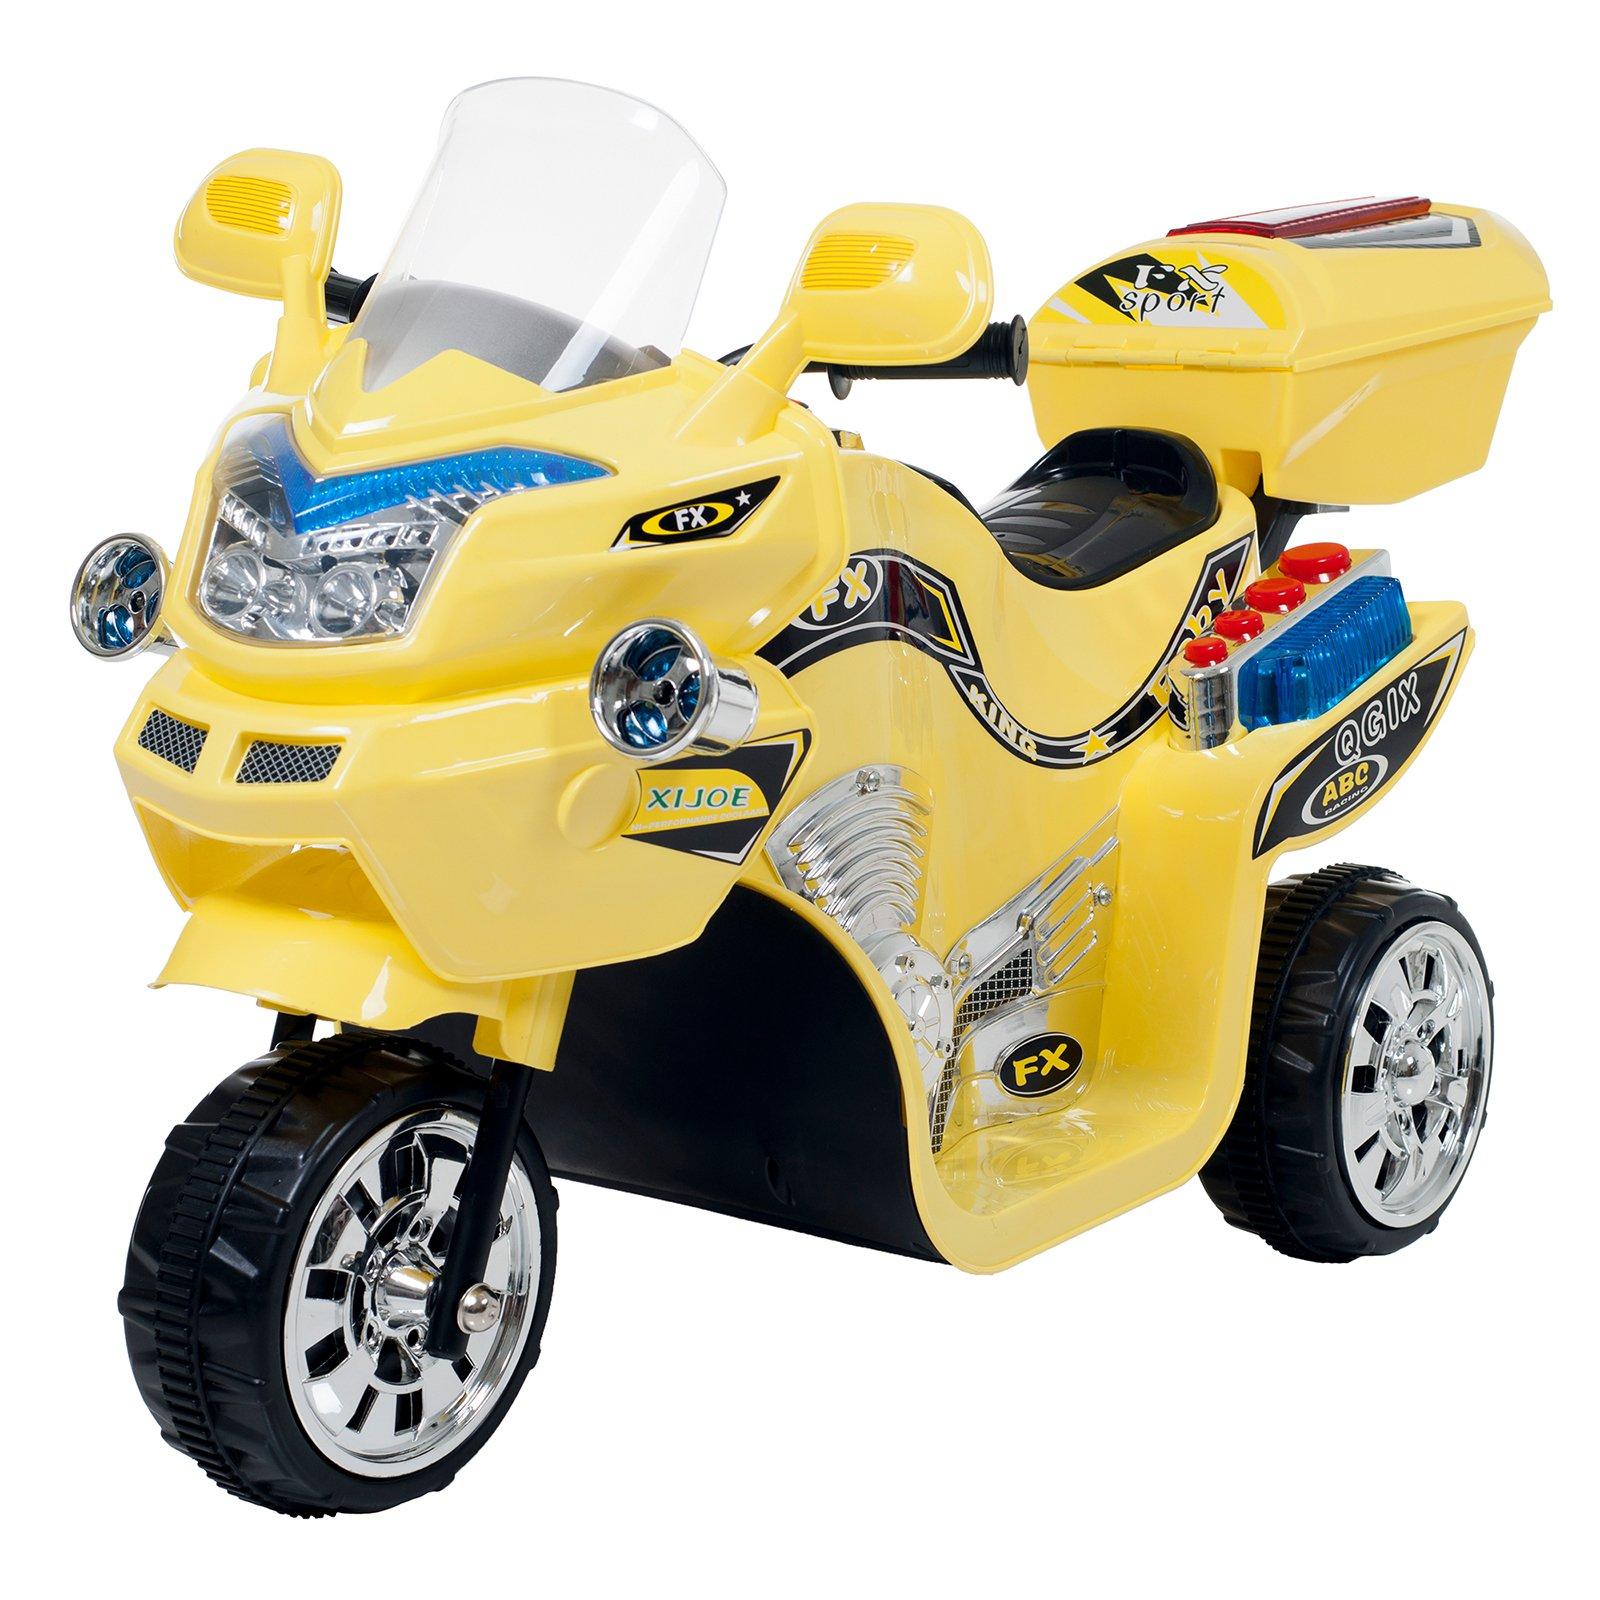 Lil' Rider Lil Rider 3 Wheel FX Sport Bike Battery Powere...